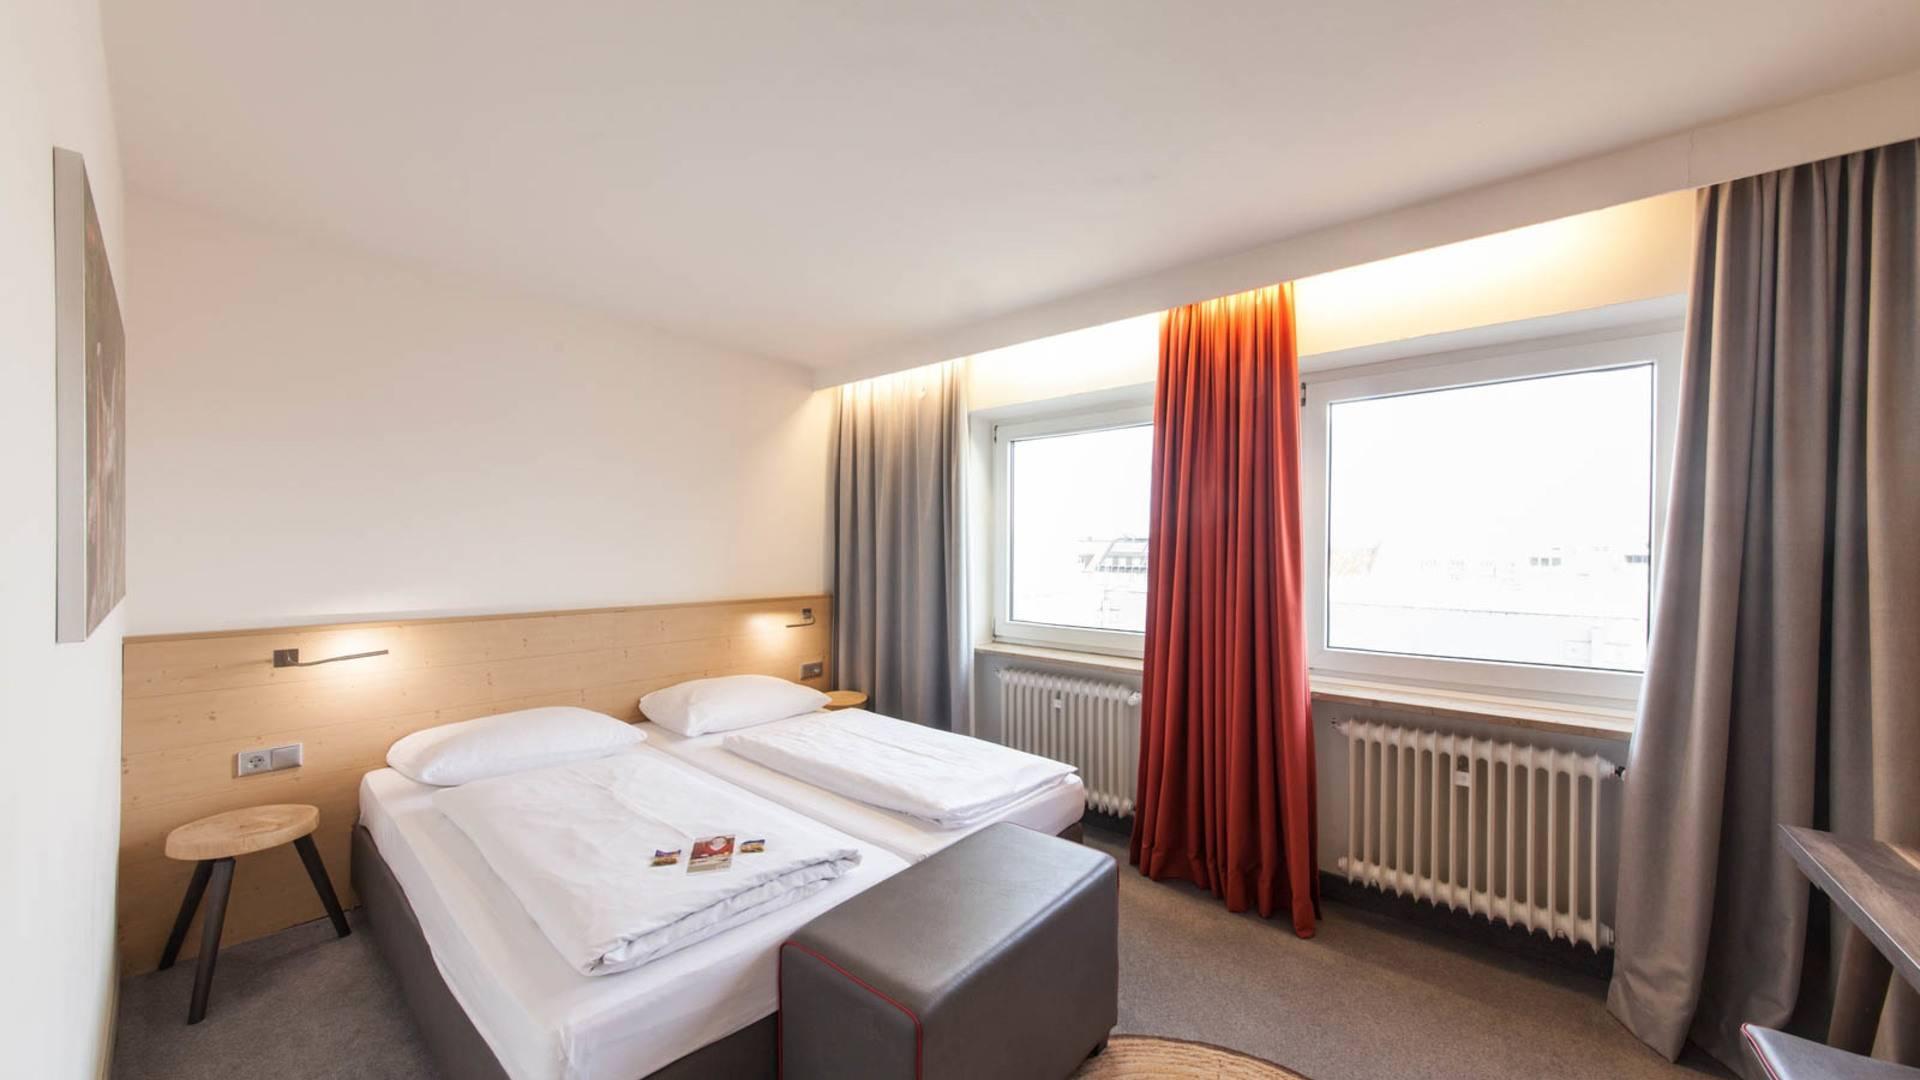 Отели в центре мюнхена